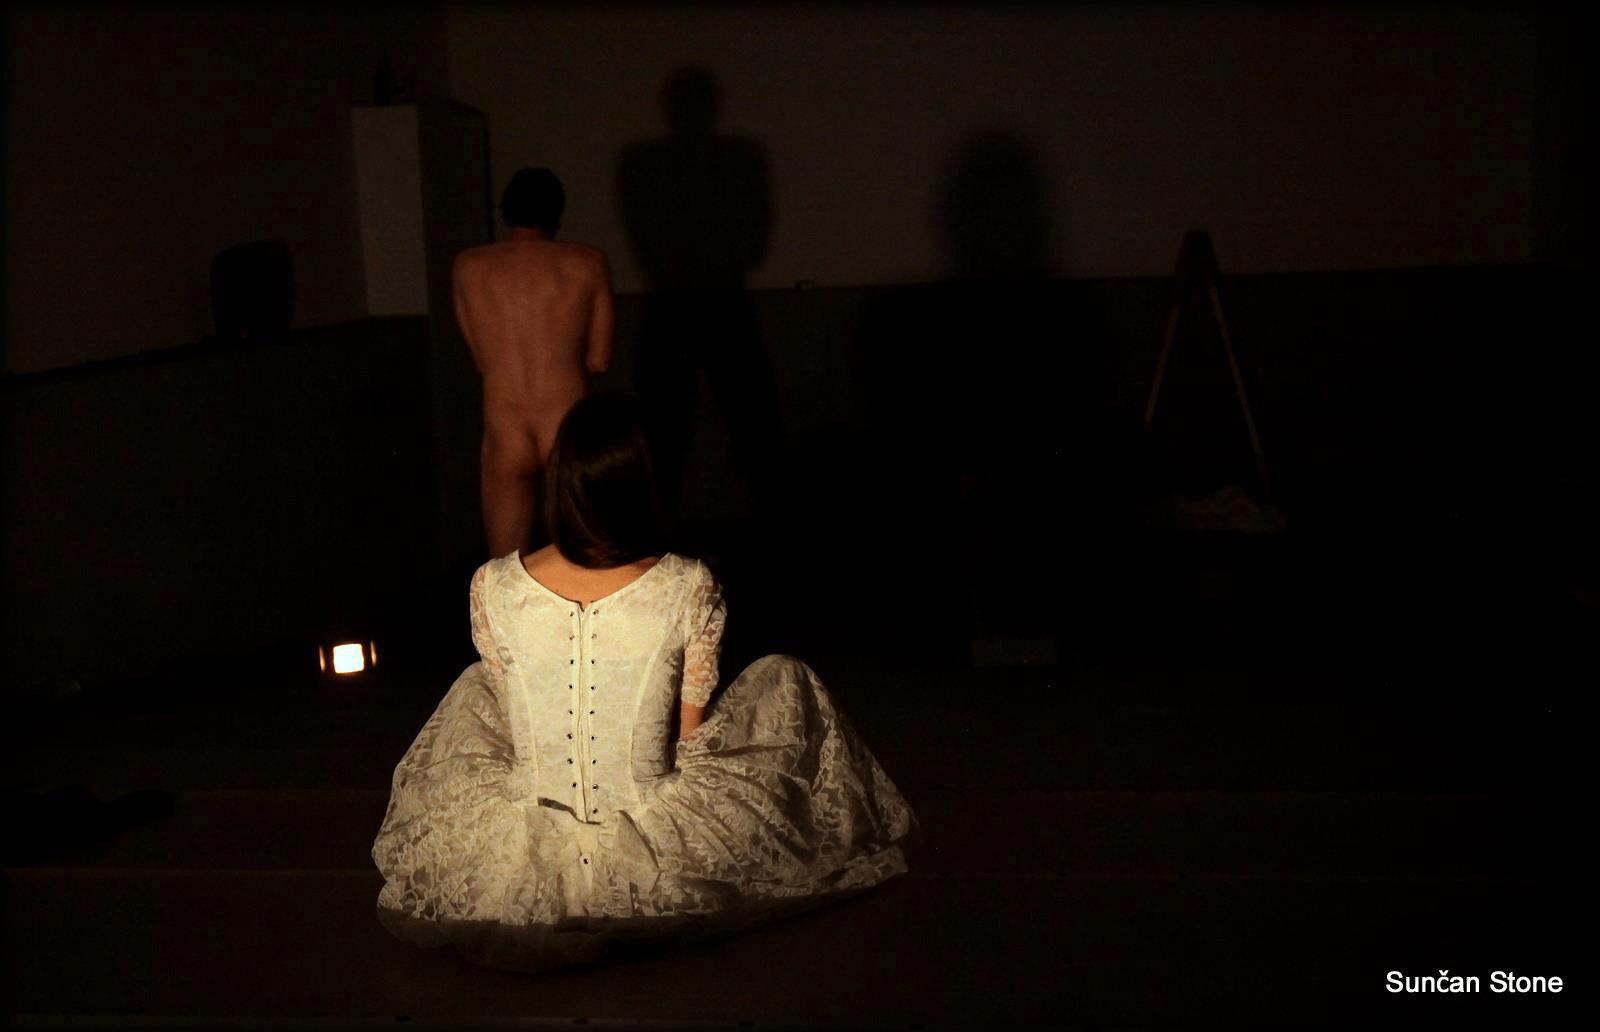 perf_nightlife_moderna_S_Anja-bride-watching-naked-Alj-moyen_2015.png